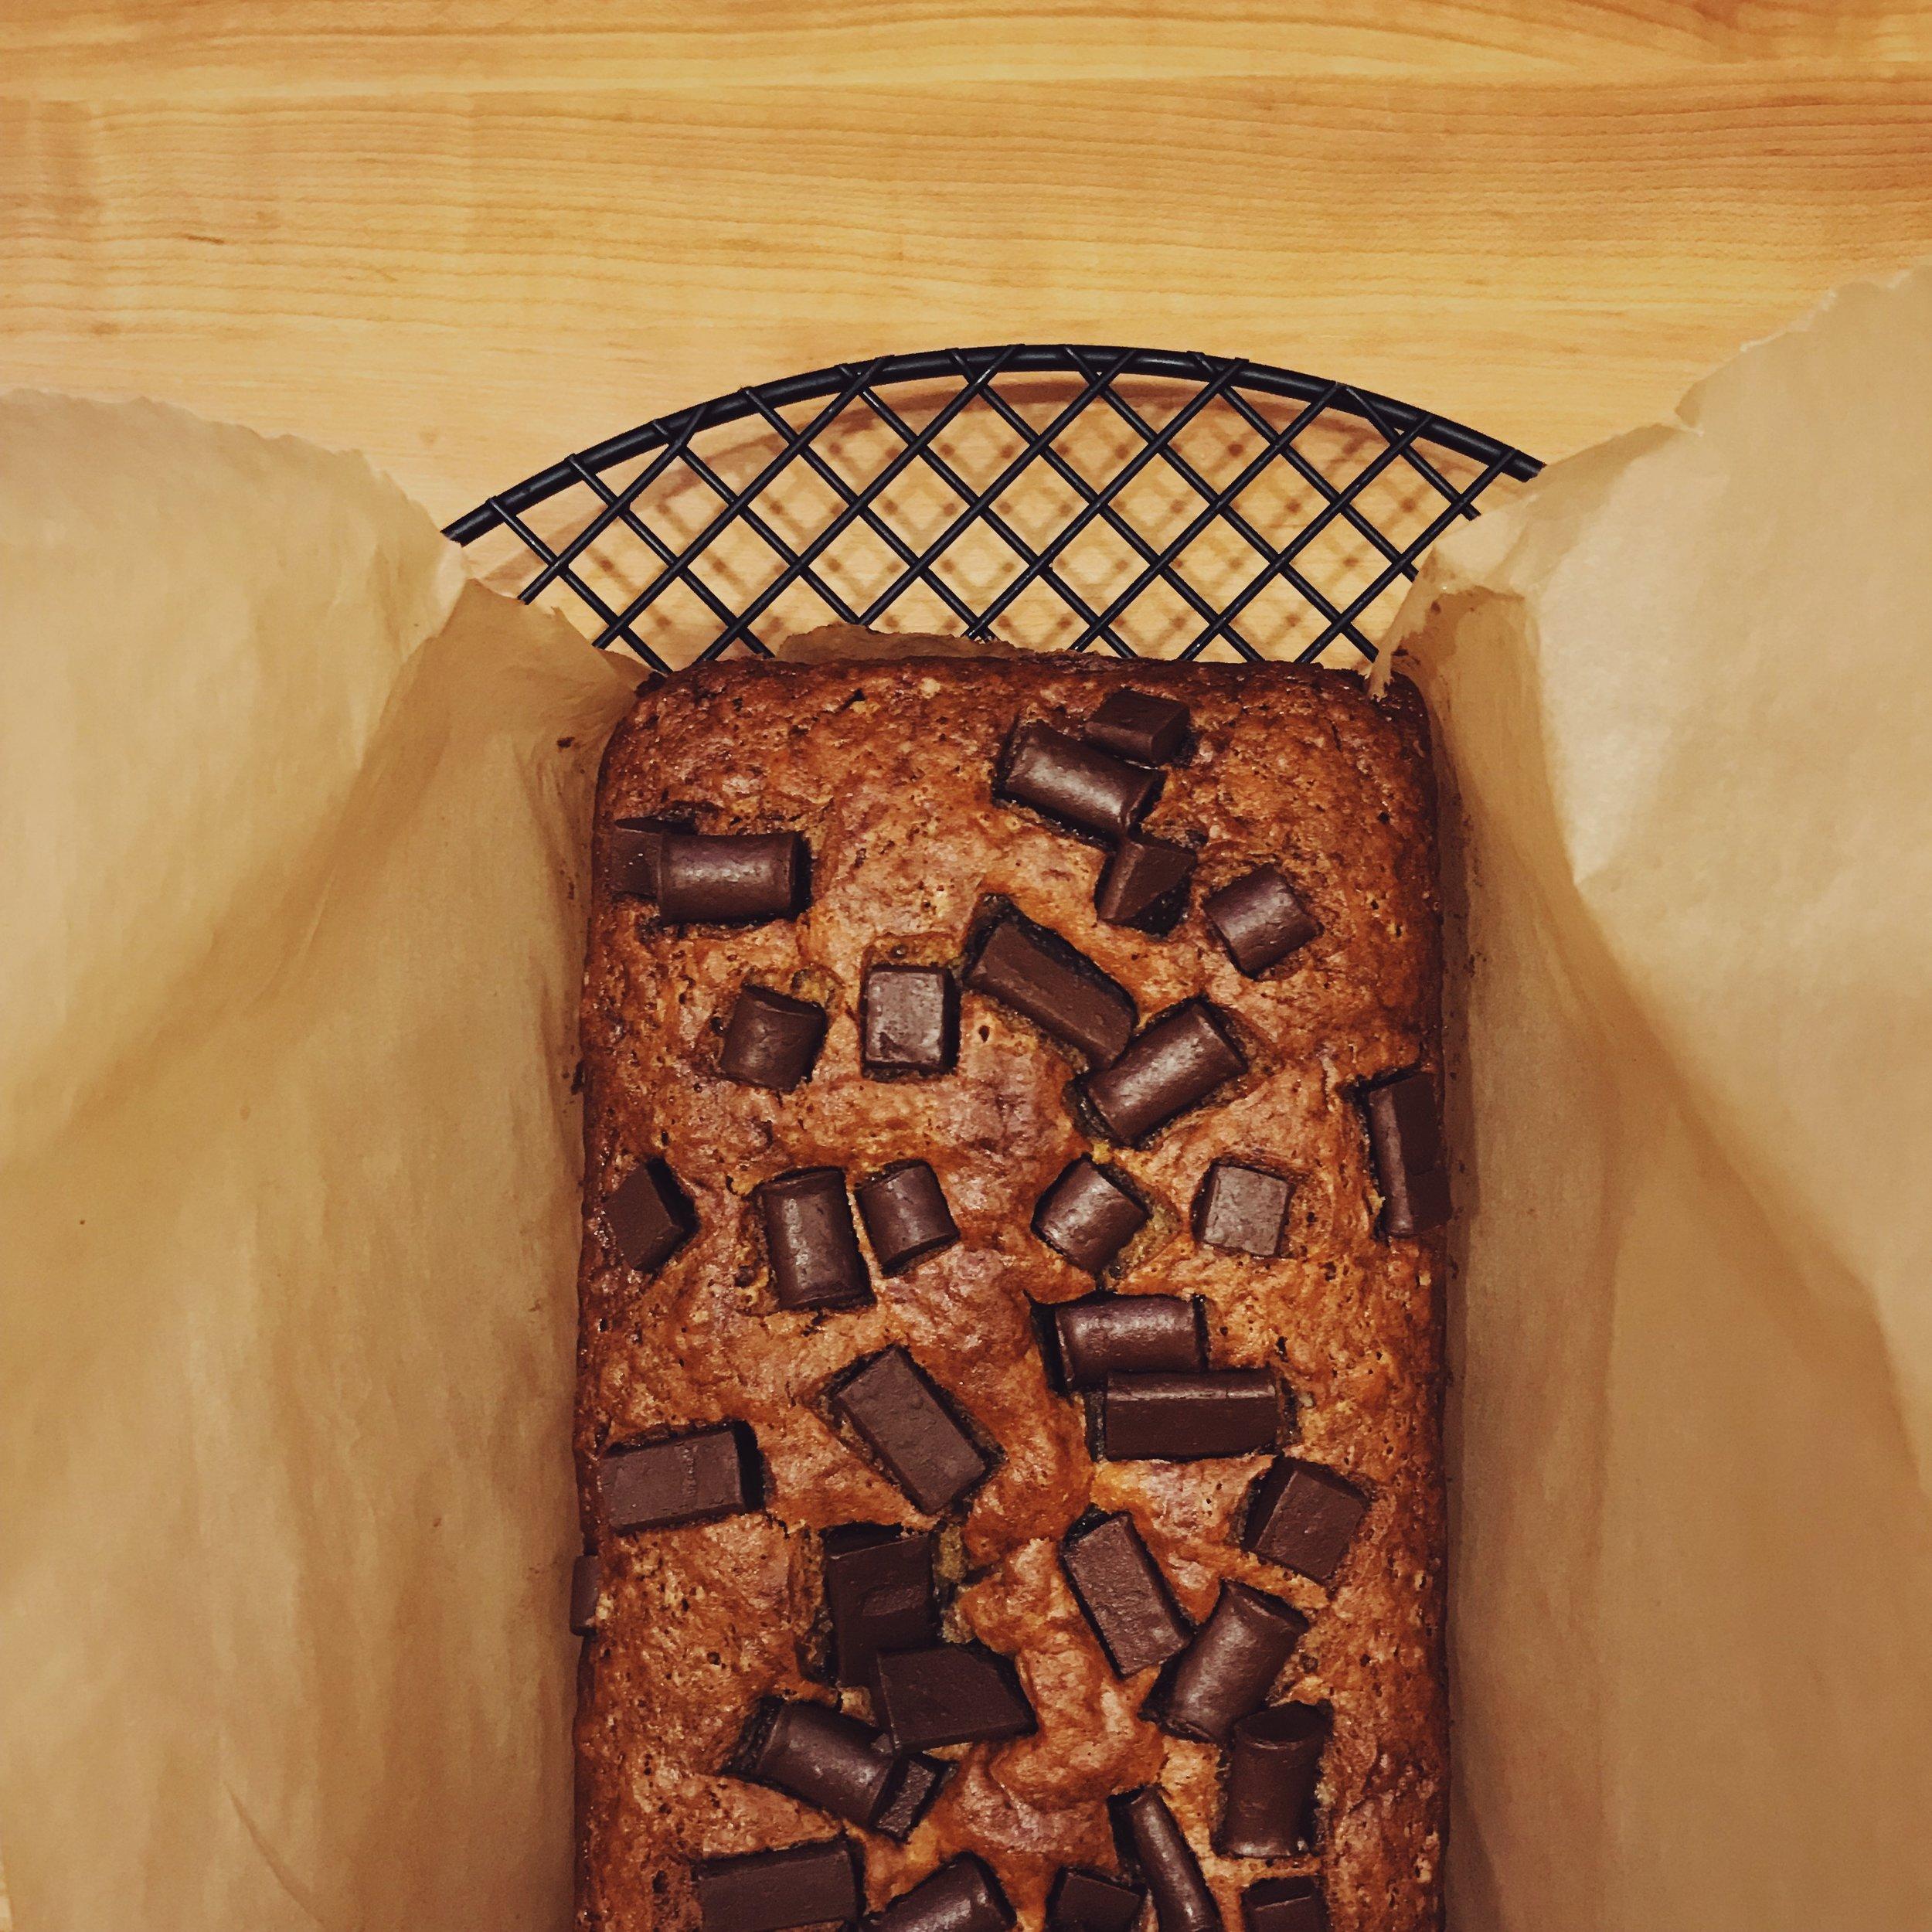 Vegan Banana Chocolate Bread